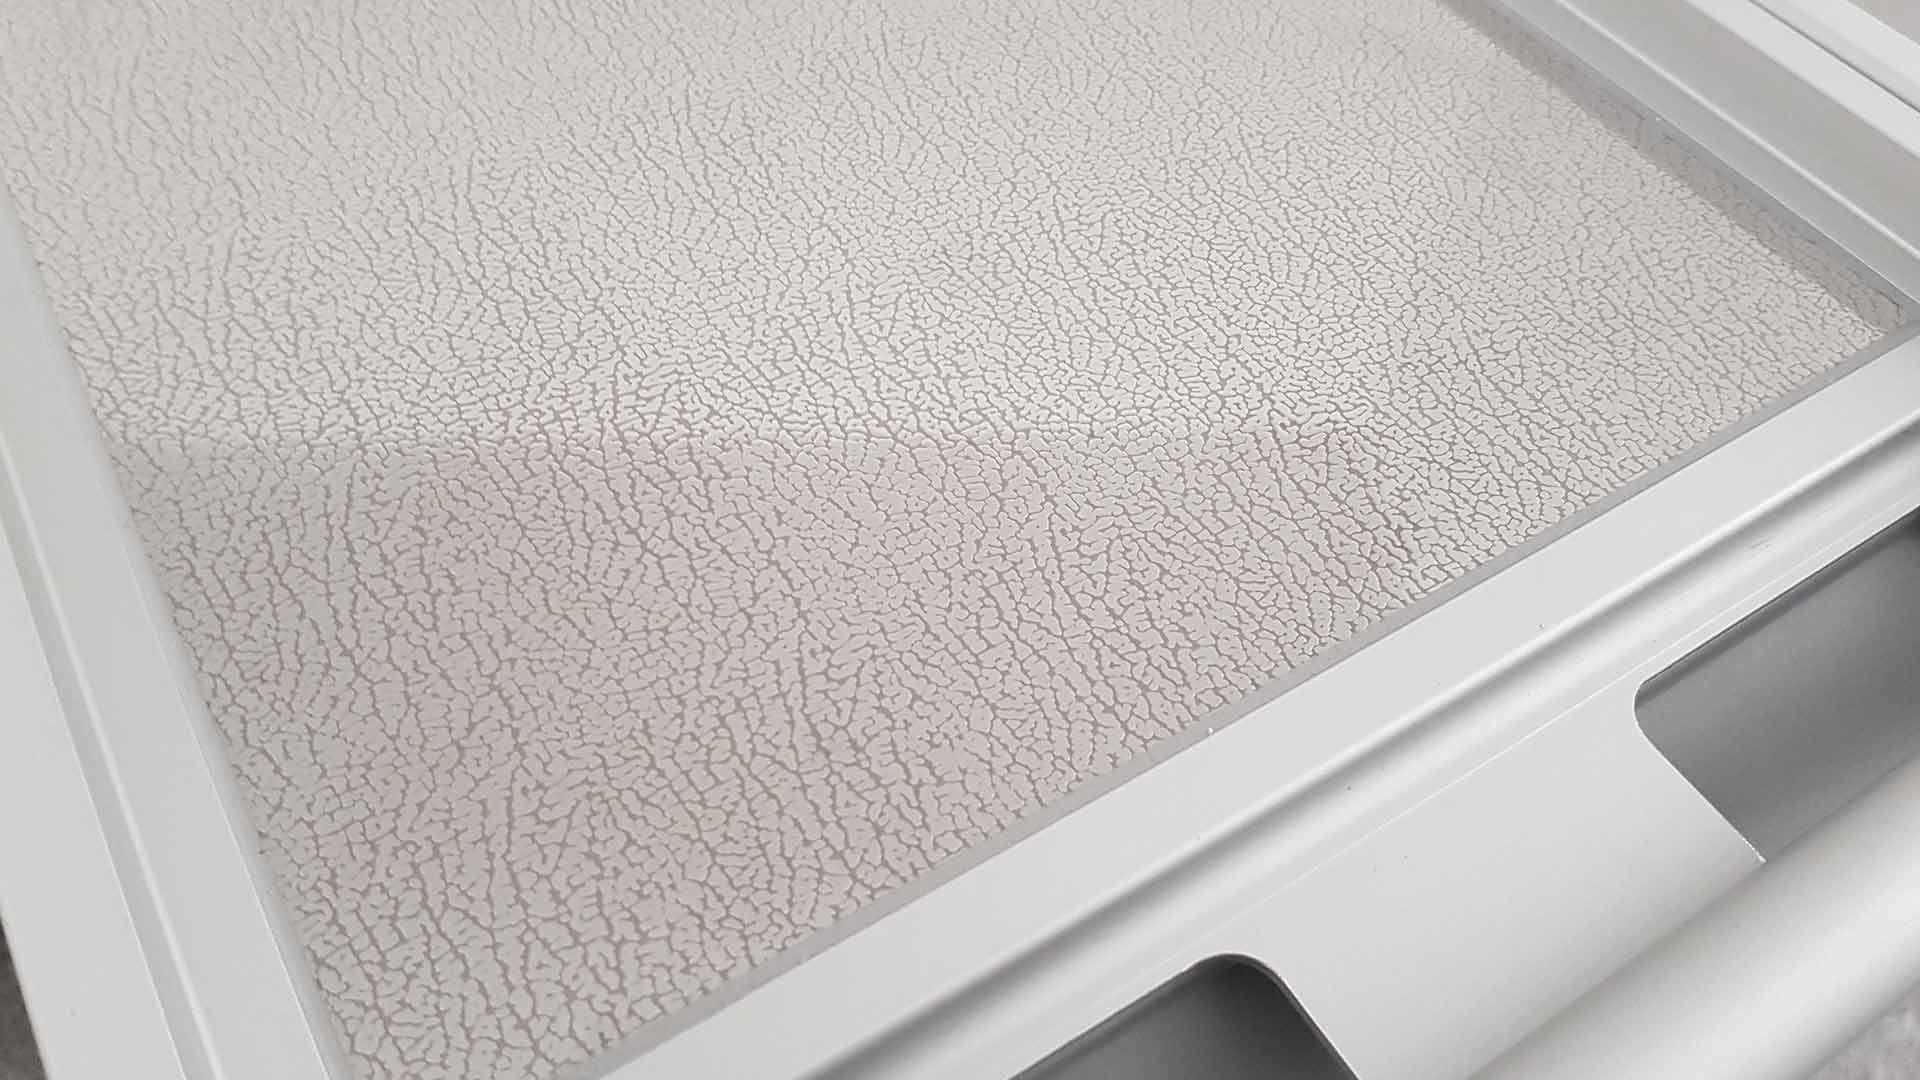 flugzeugtrolley neu weiss grauer griff. Black Bedroom Furniture Sets. Home Design Ideas